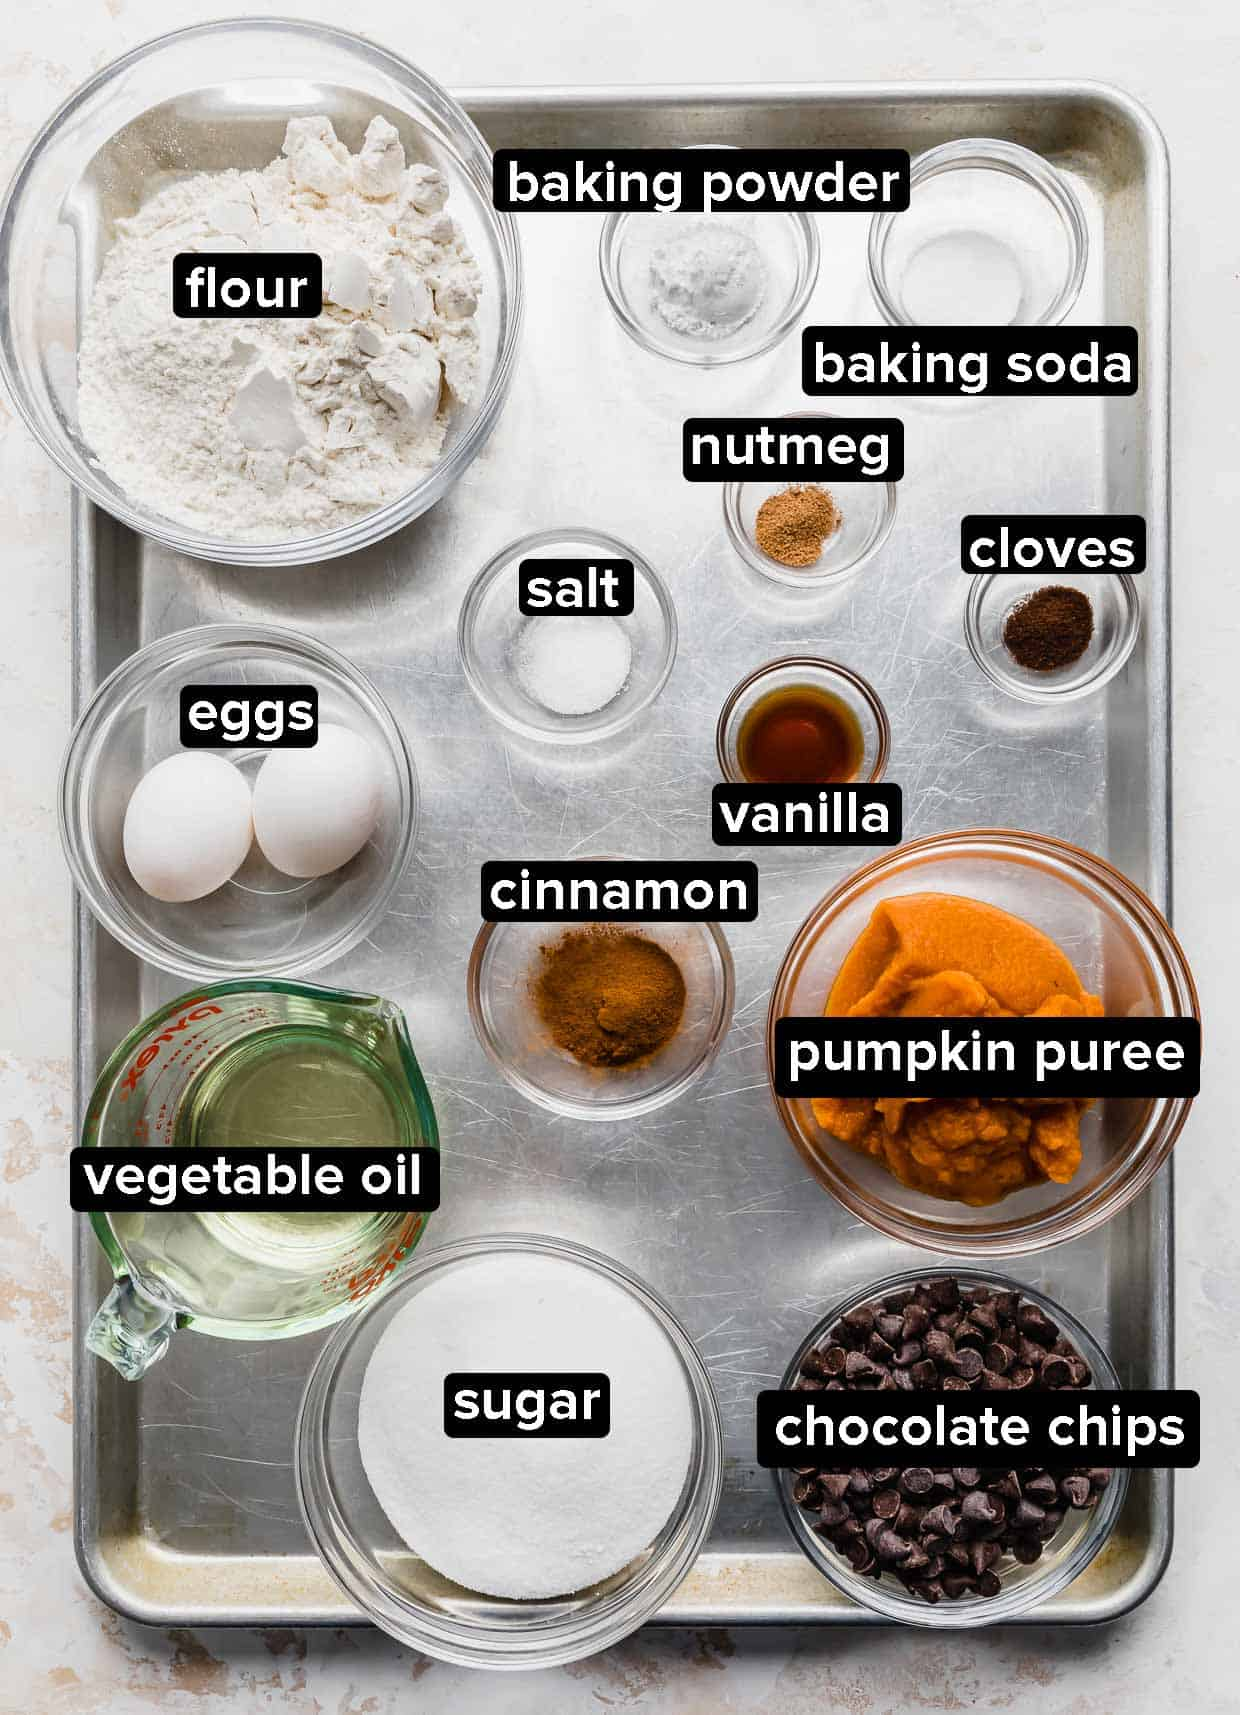 Pumpkin Chocolate Chip Cookies ingredients on a silver baking sheet.